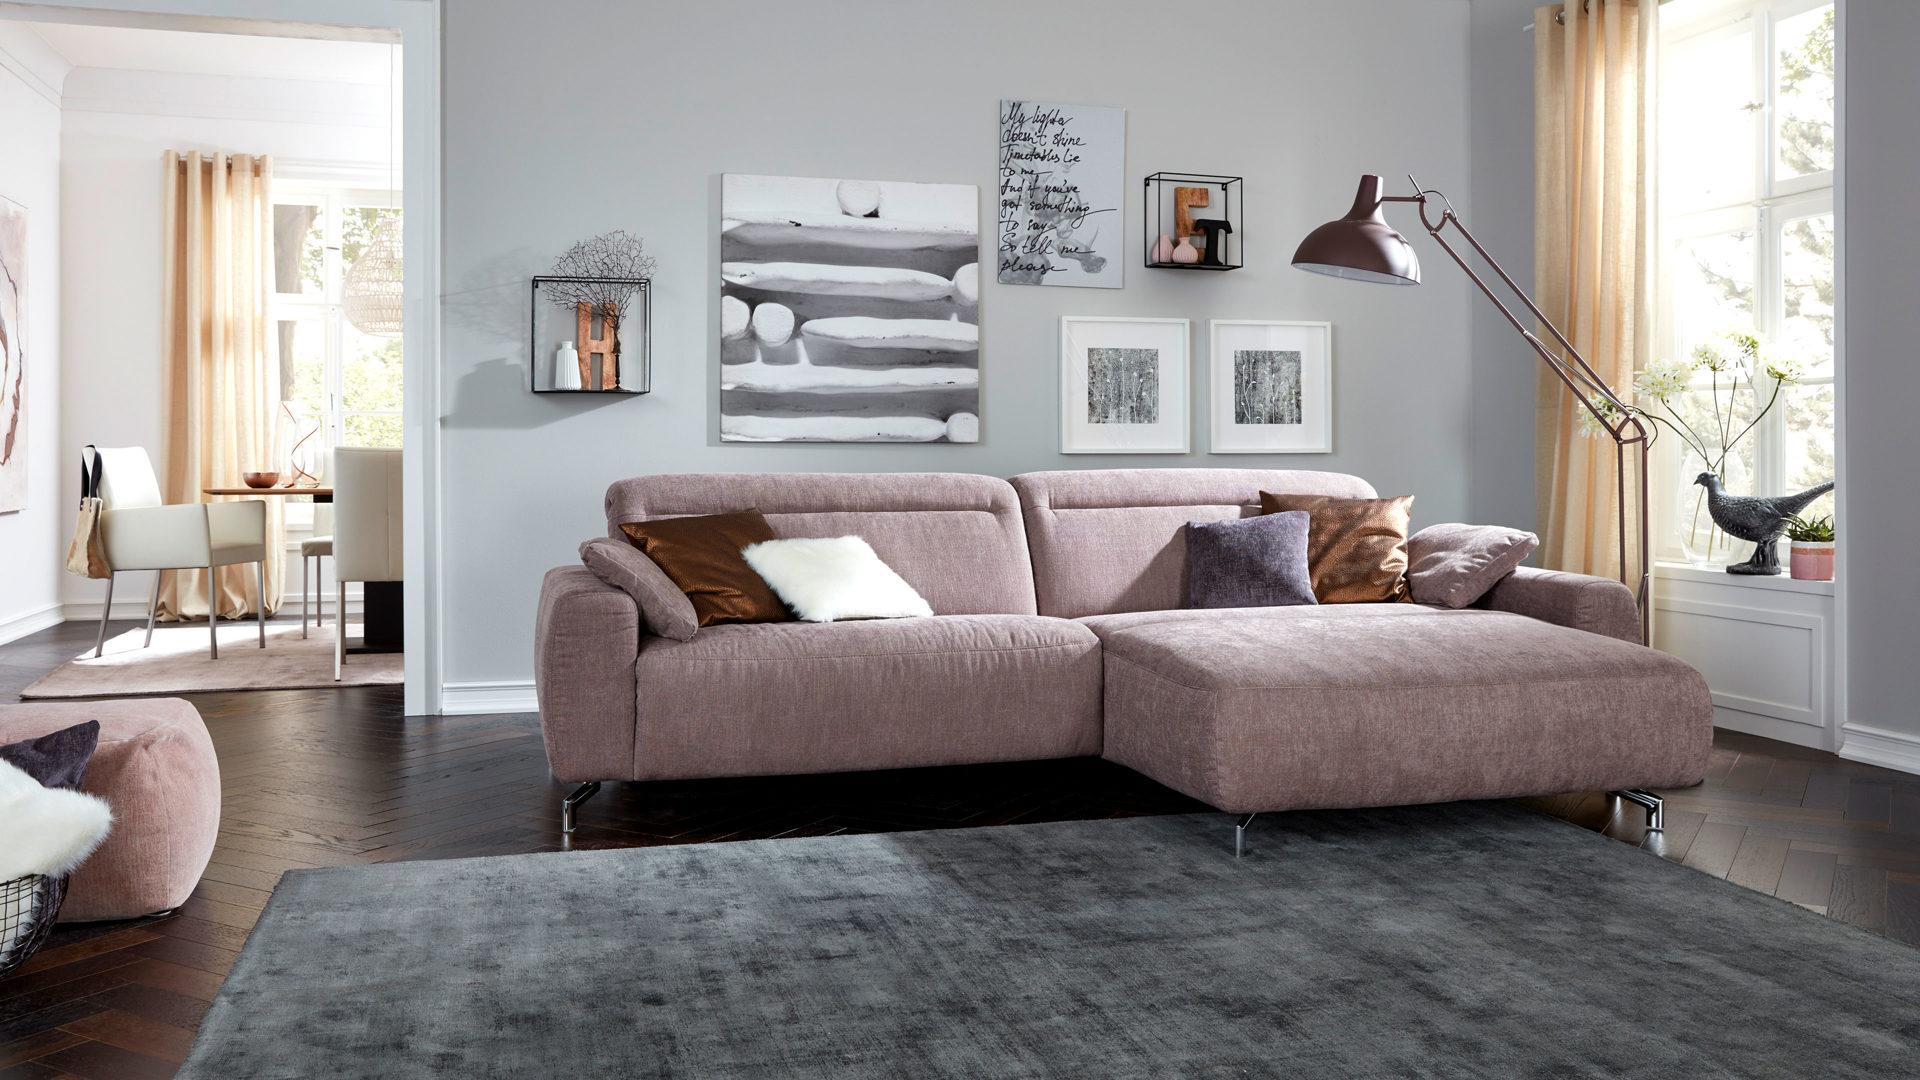 mobel boer coesfeld mobel boer interliving interliving sofa serie 4151 eckkombination lavendelfarbener stoffbezug 635 95 schenkelmass ca